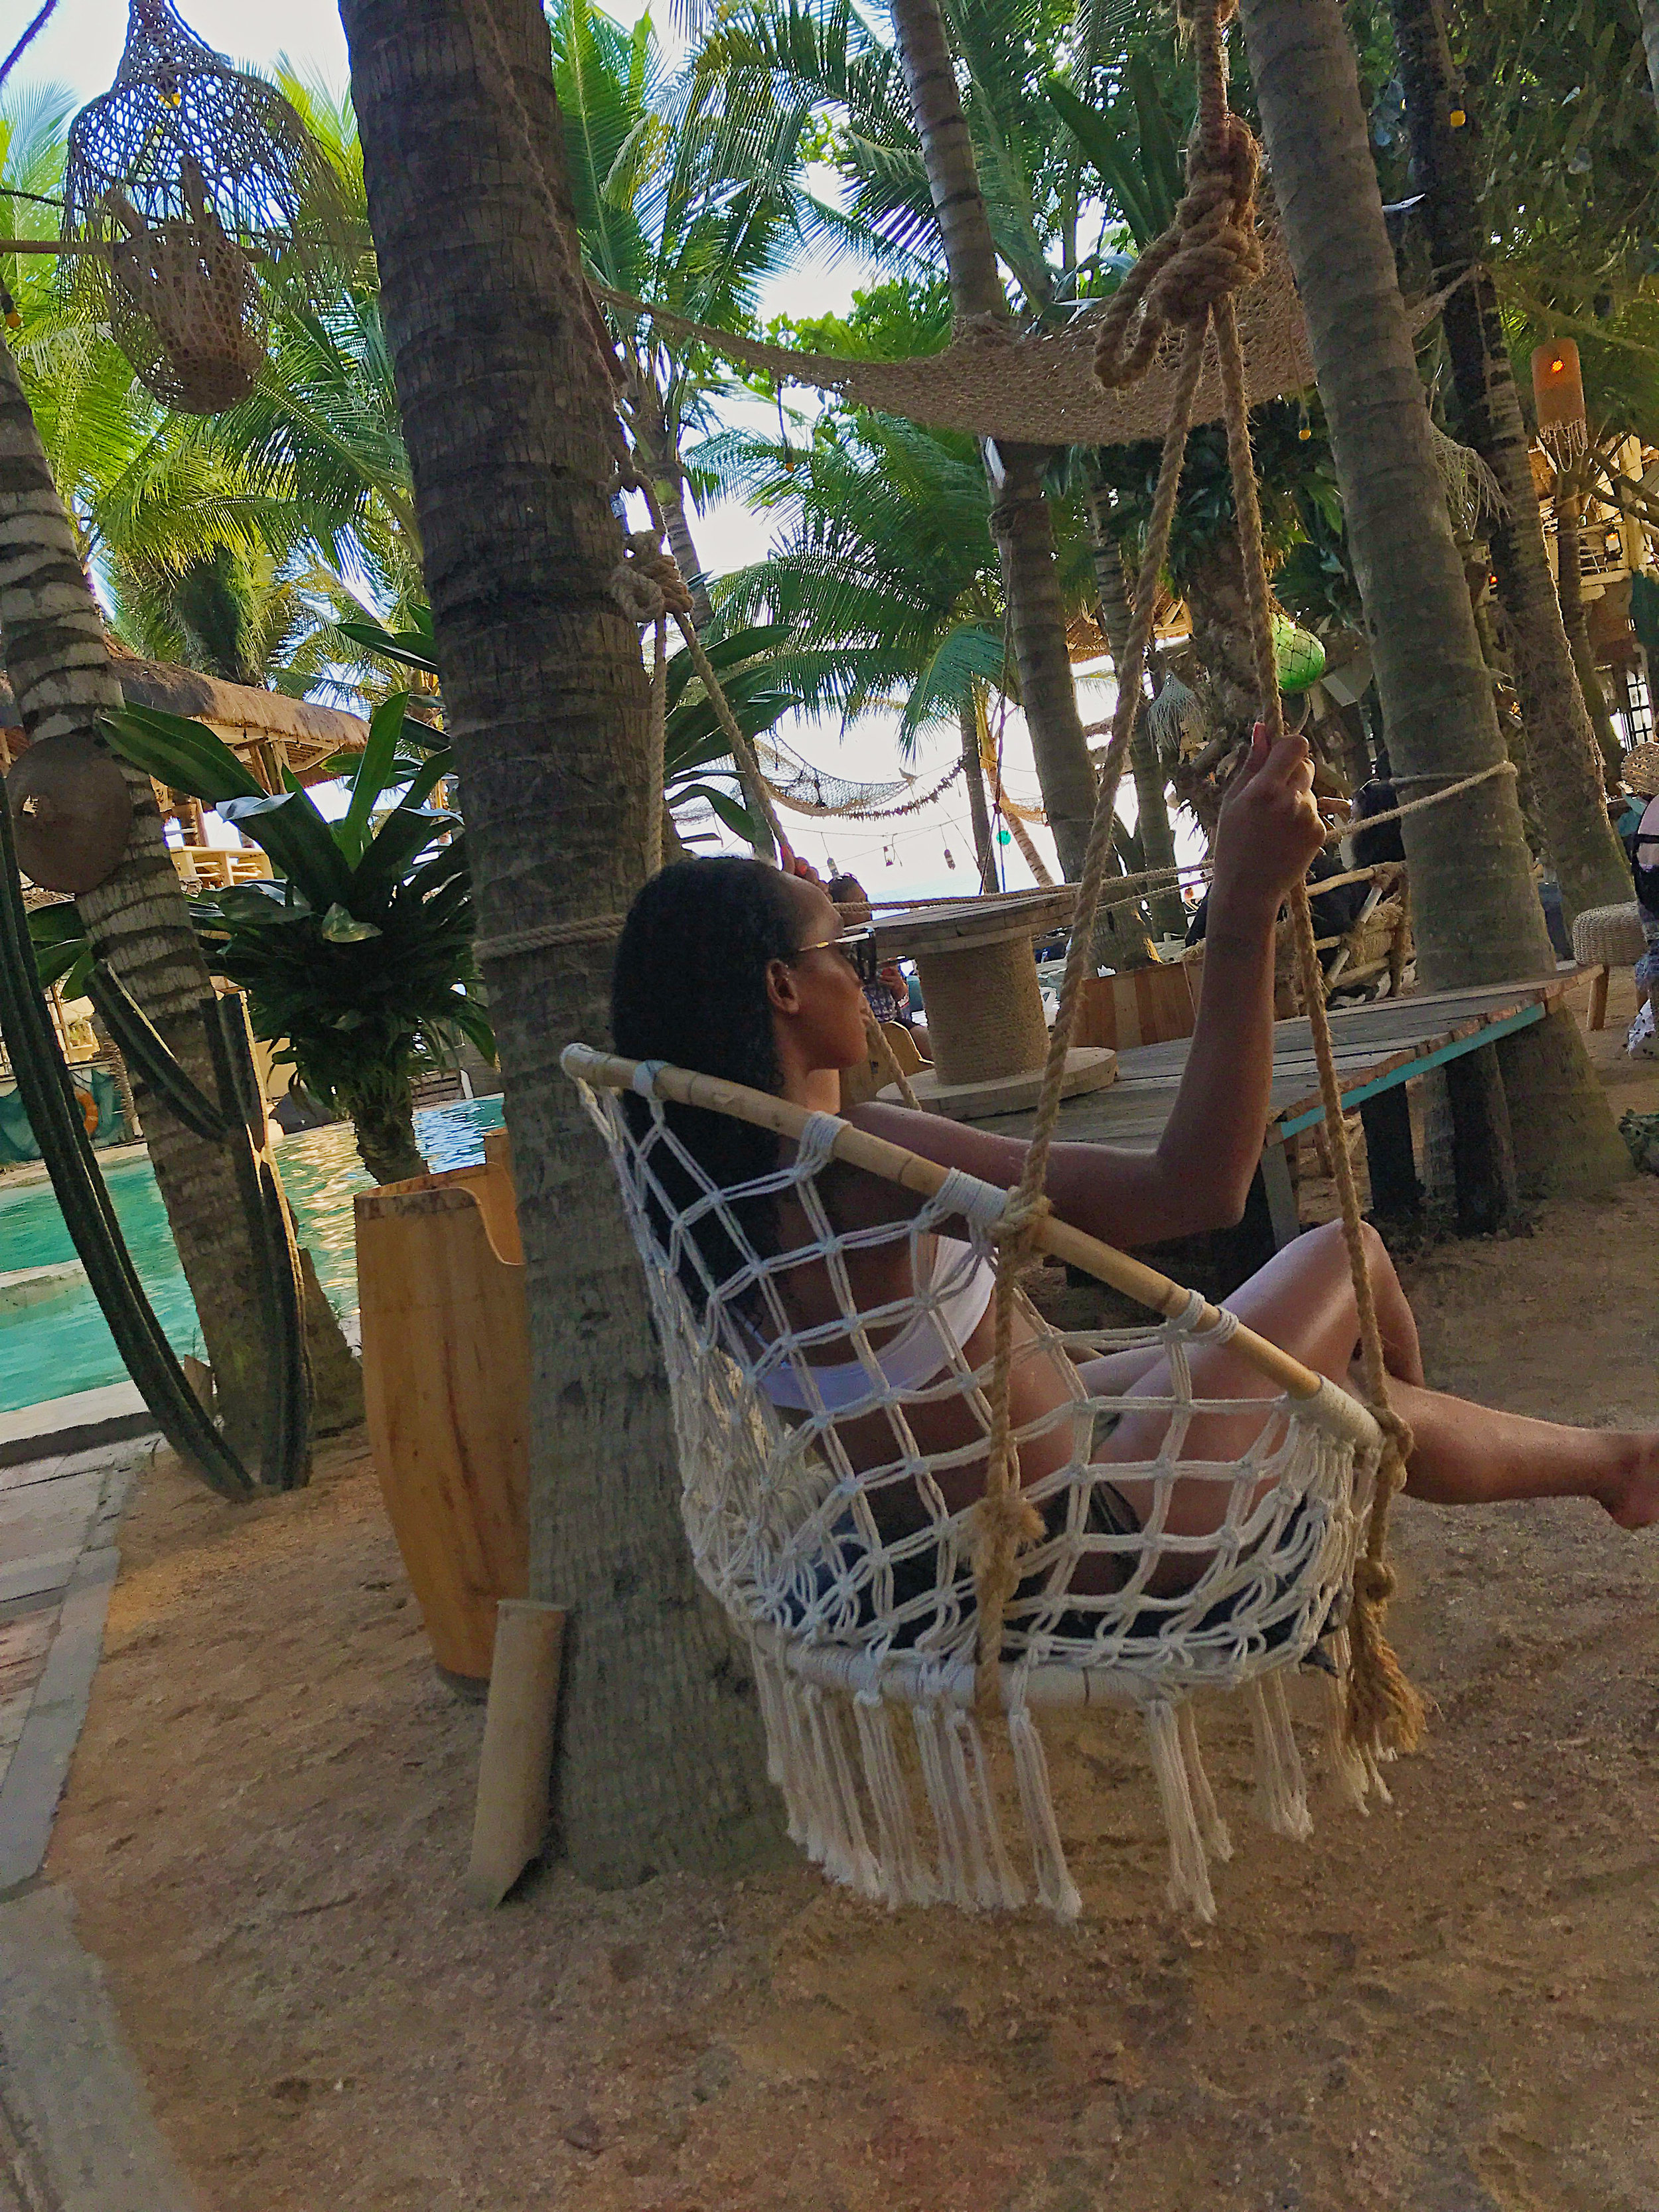 La Brisa, Bali swing chair HelenaAlyssa